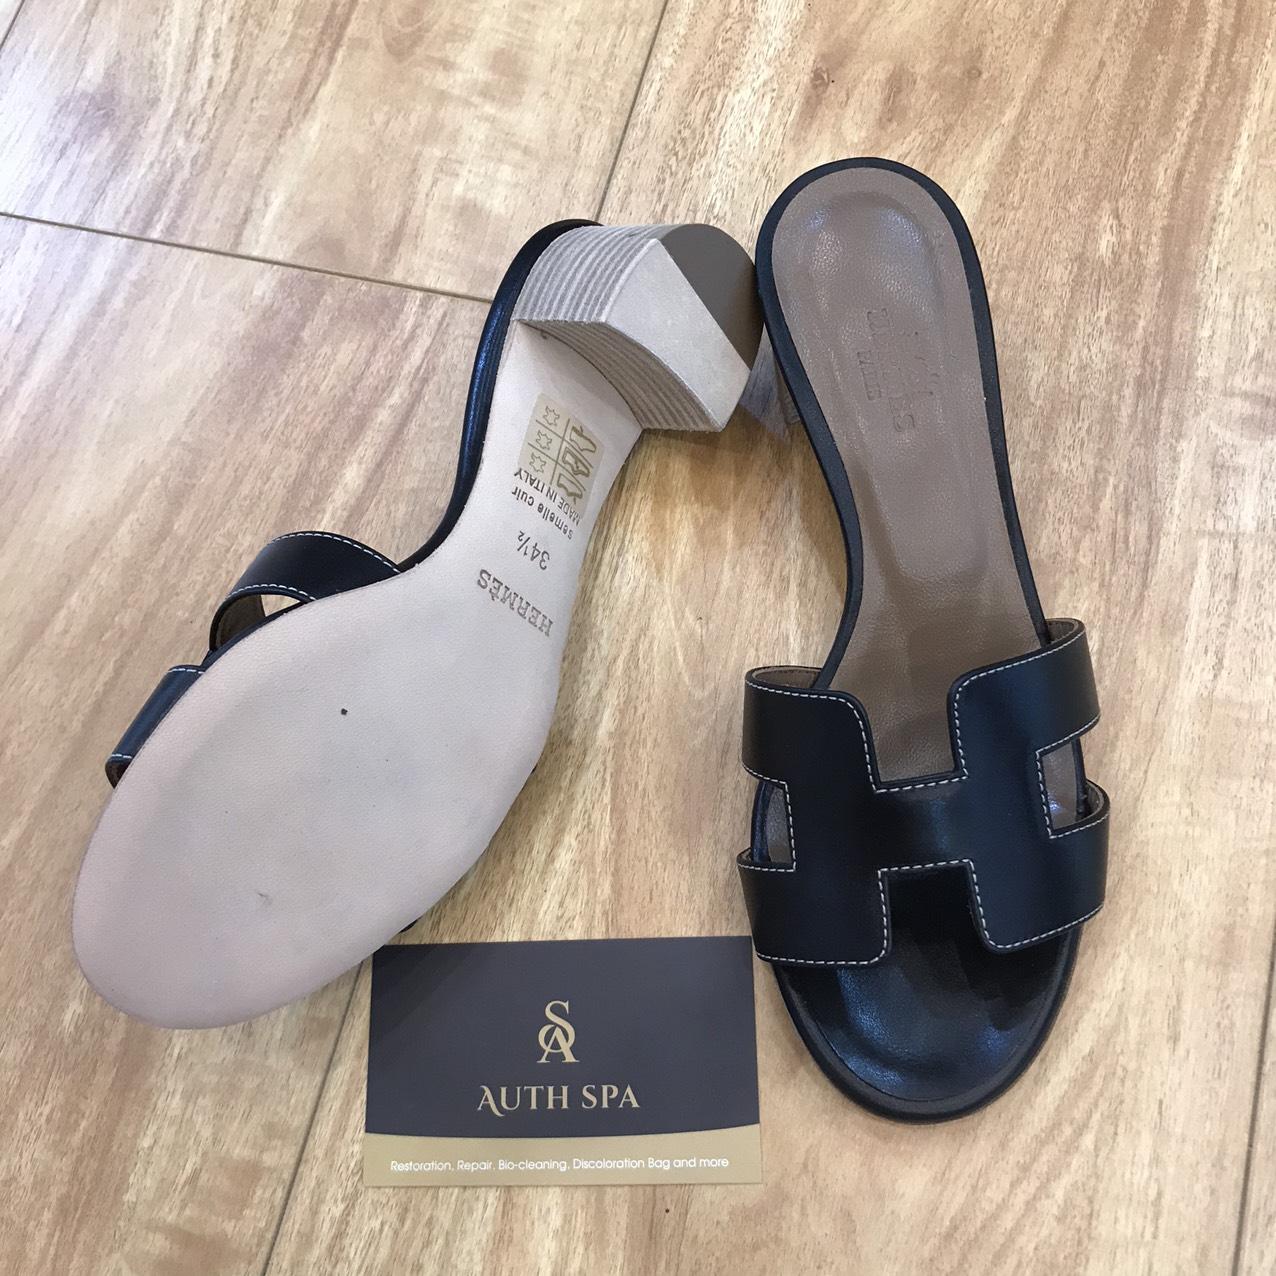 Sửa Chữa Giày Dép Gucci, Chanel, Louis Vuitton, Hermes ... 10